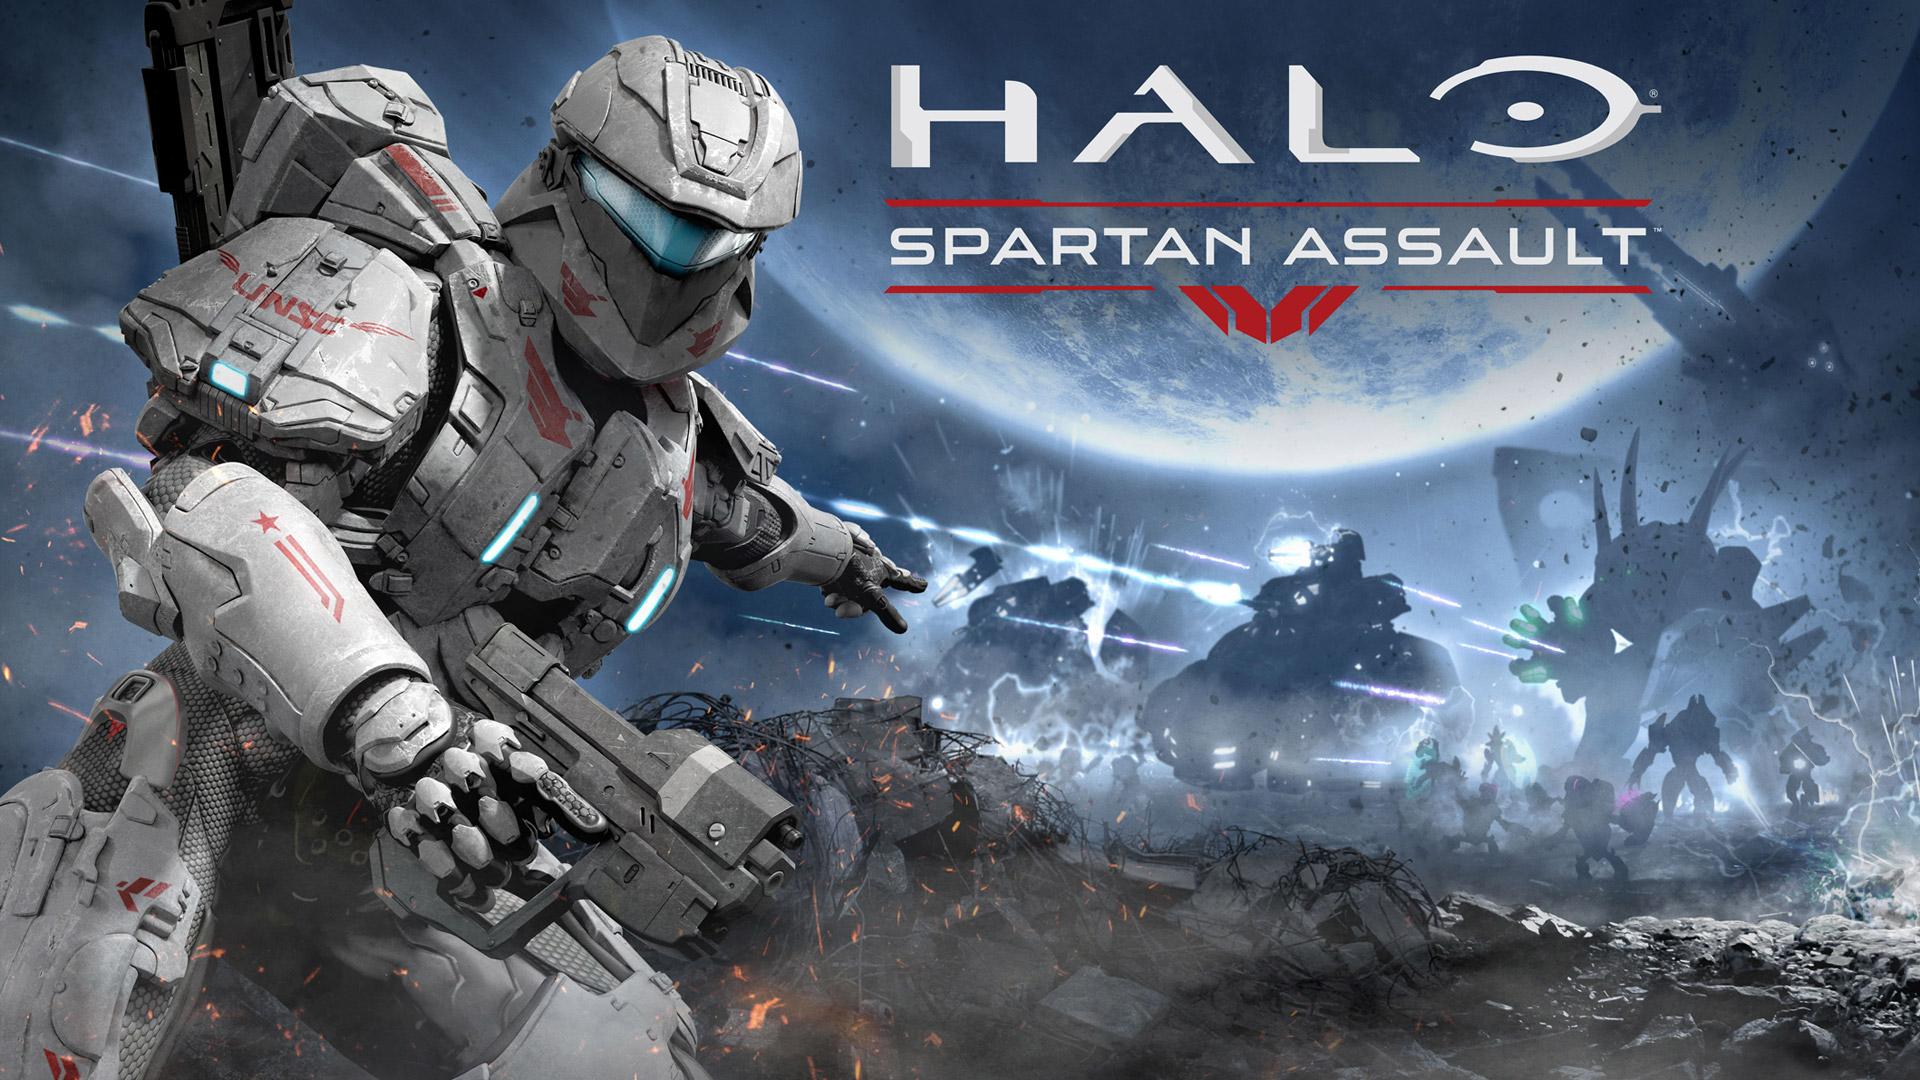 Free Halo: Spartan Assault Wallpaper in 1920x1080